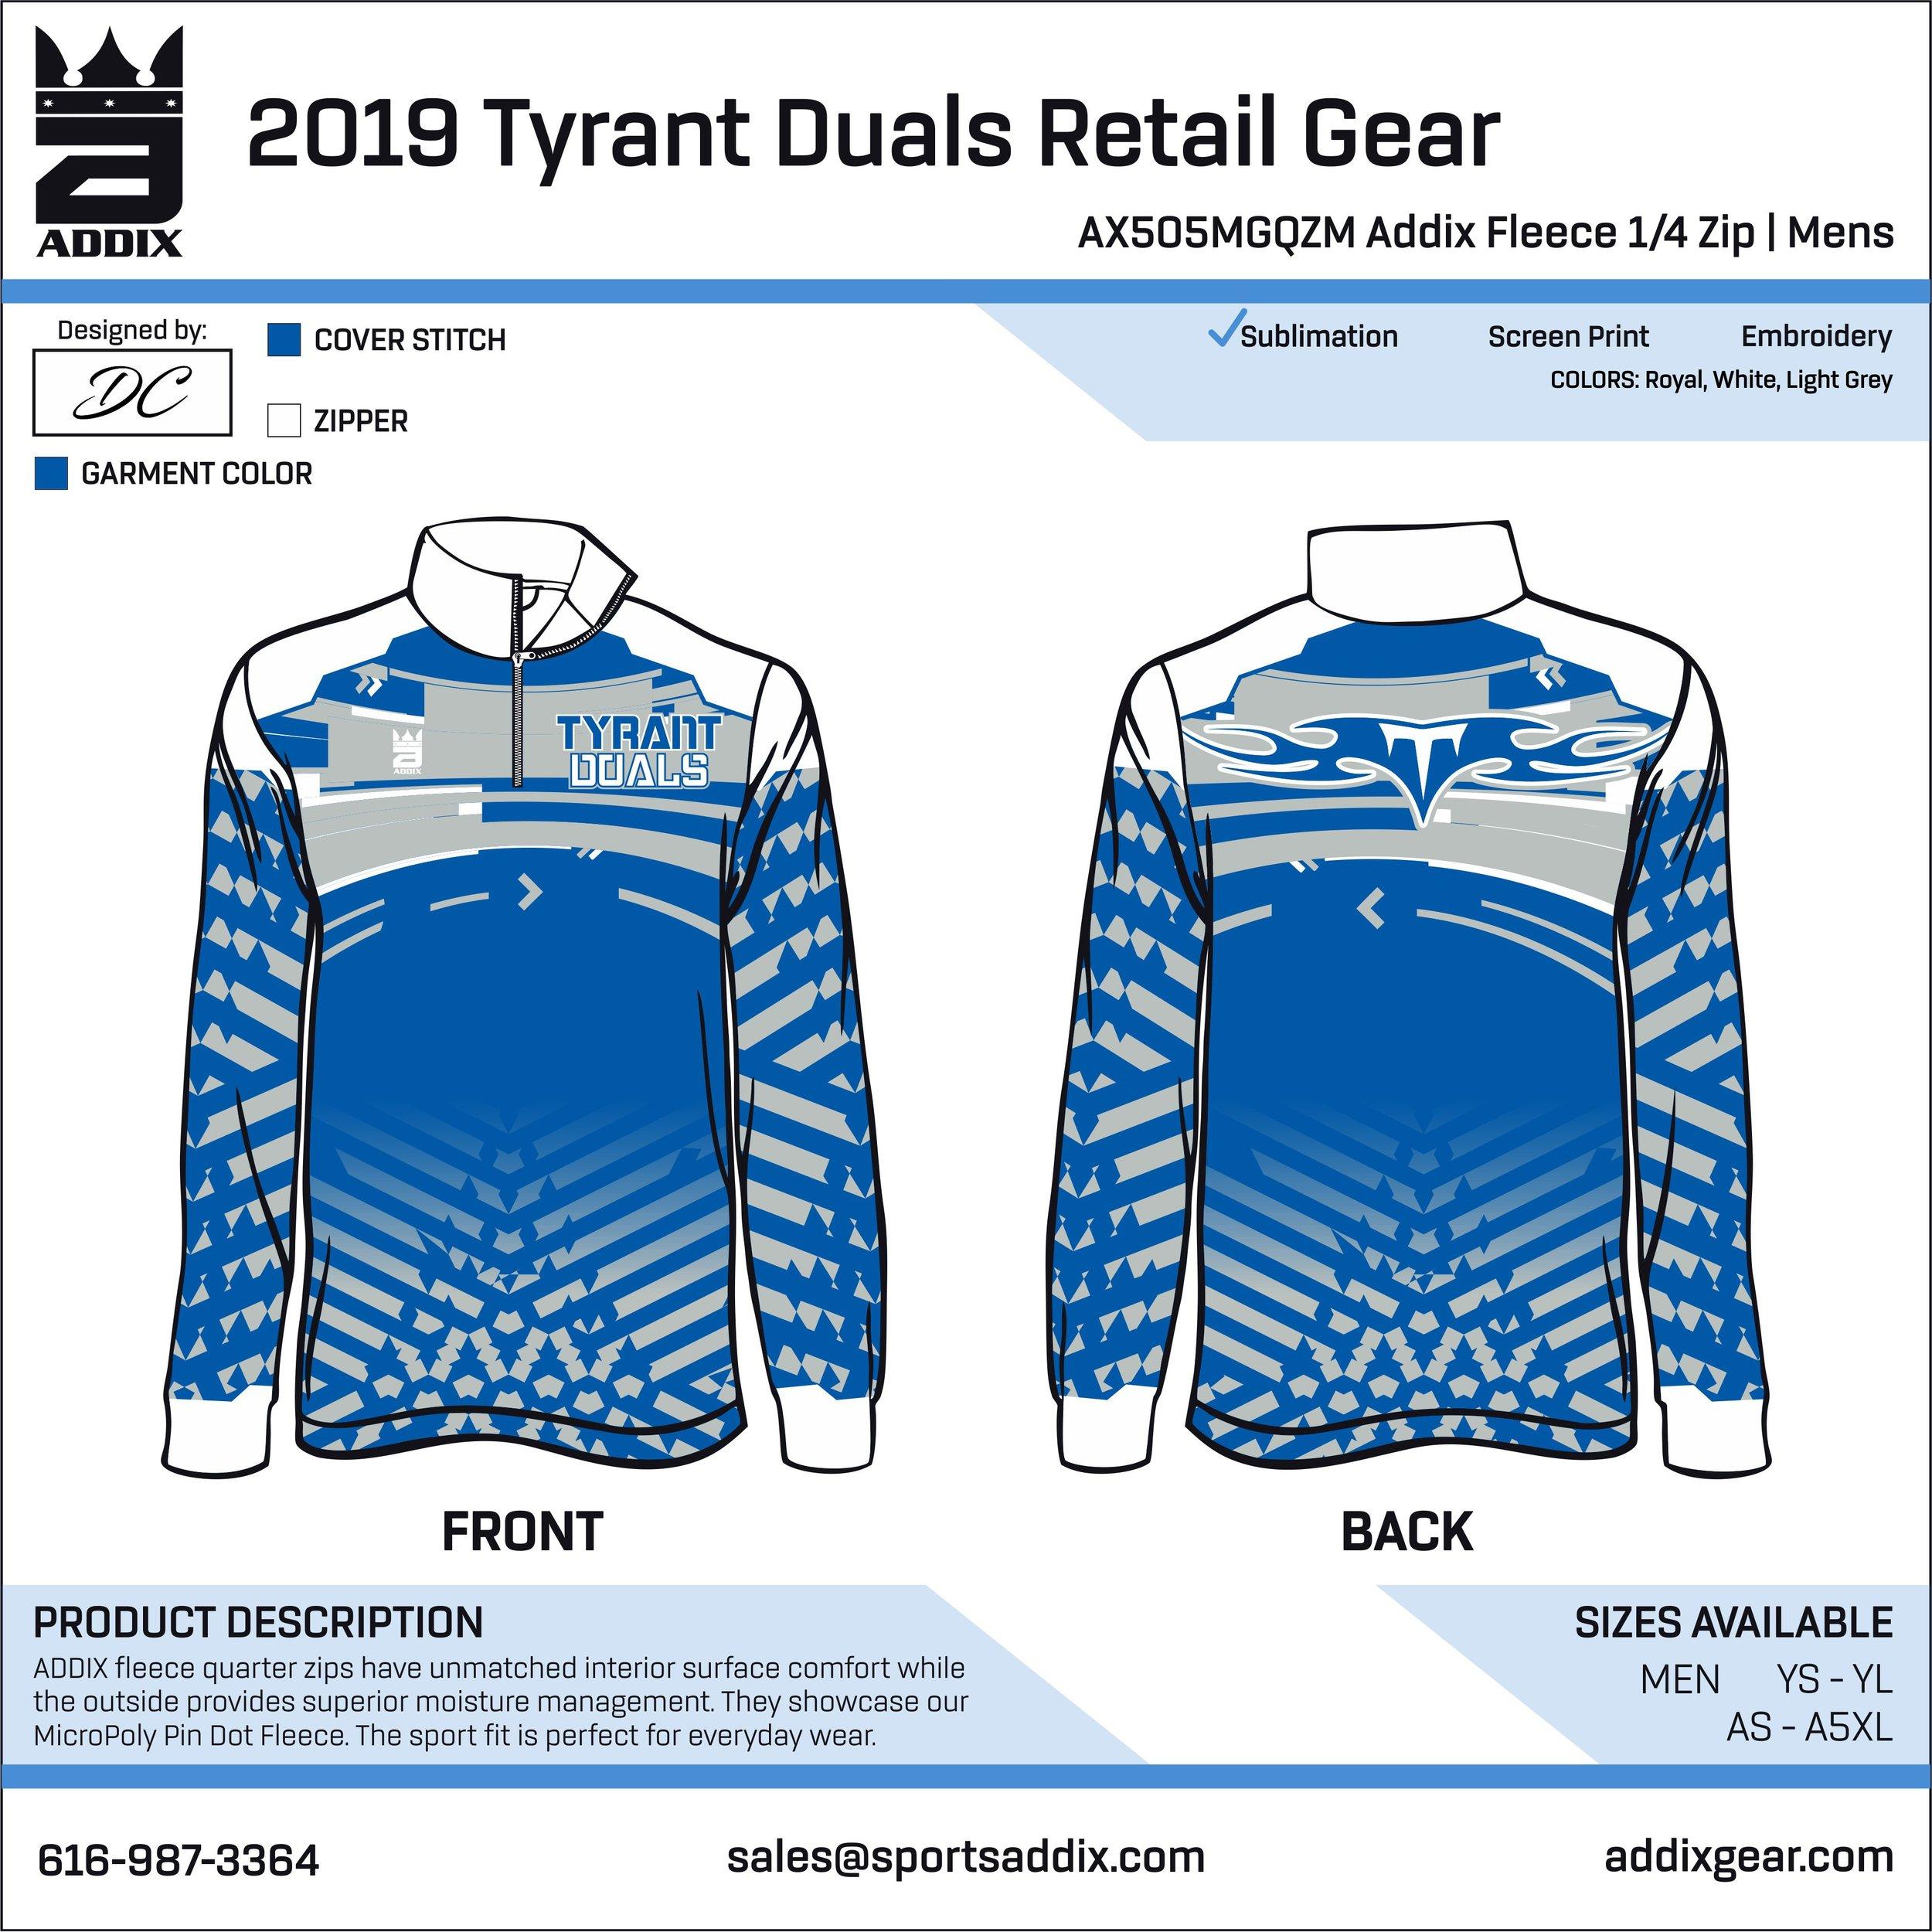 2019 Tyrant Duals Retail Gear_2018_12-18_DC_LS HVY QZ.jpg